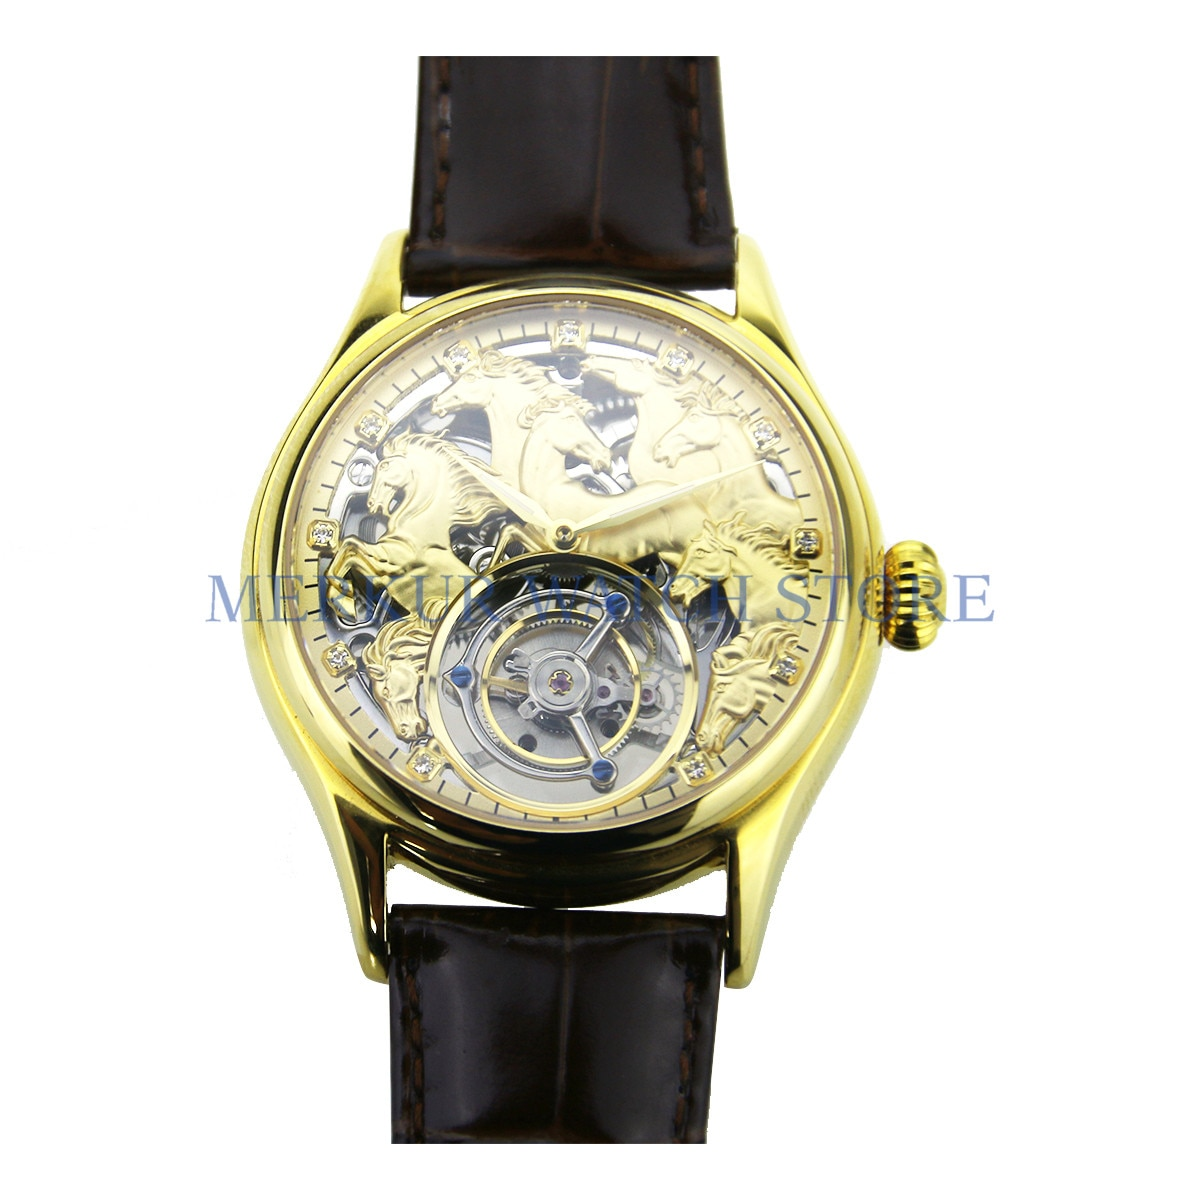 ميركور رجالي ساعة ميكانيكية تيانجين هانغتشو عالية فاز توربيون سكيلينتون 1